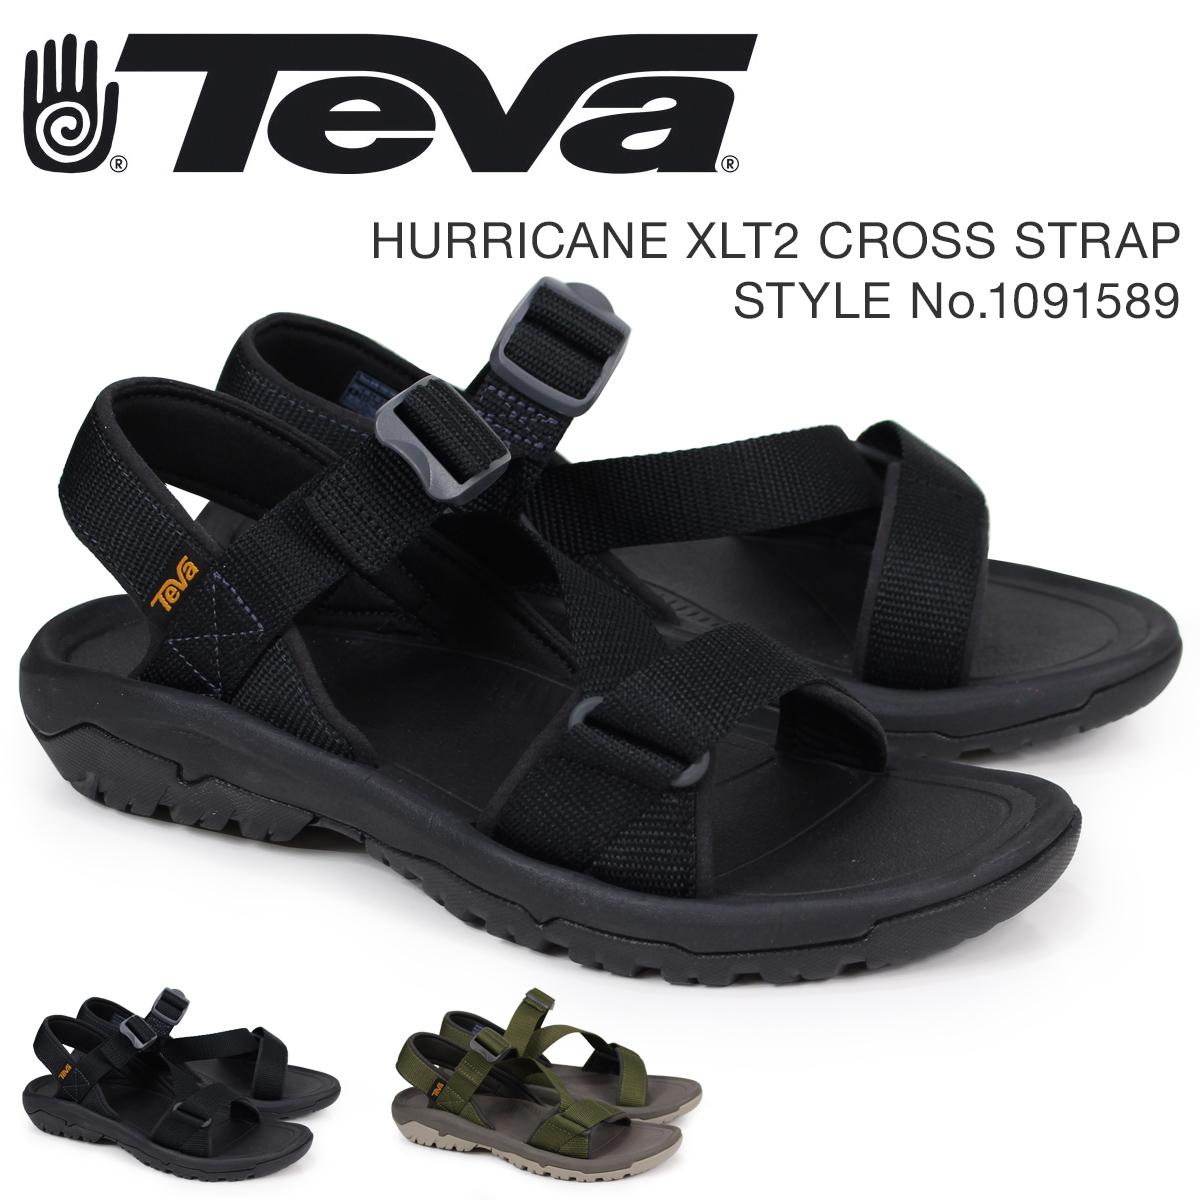 9350041a6764 Teva Teva sandals men hurricane XLT2 HURRICANE CROSS STRAP black dark olive  1091589  4 18 Shinnyu load